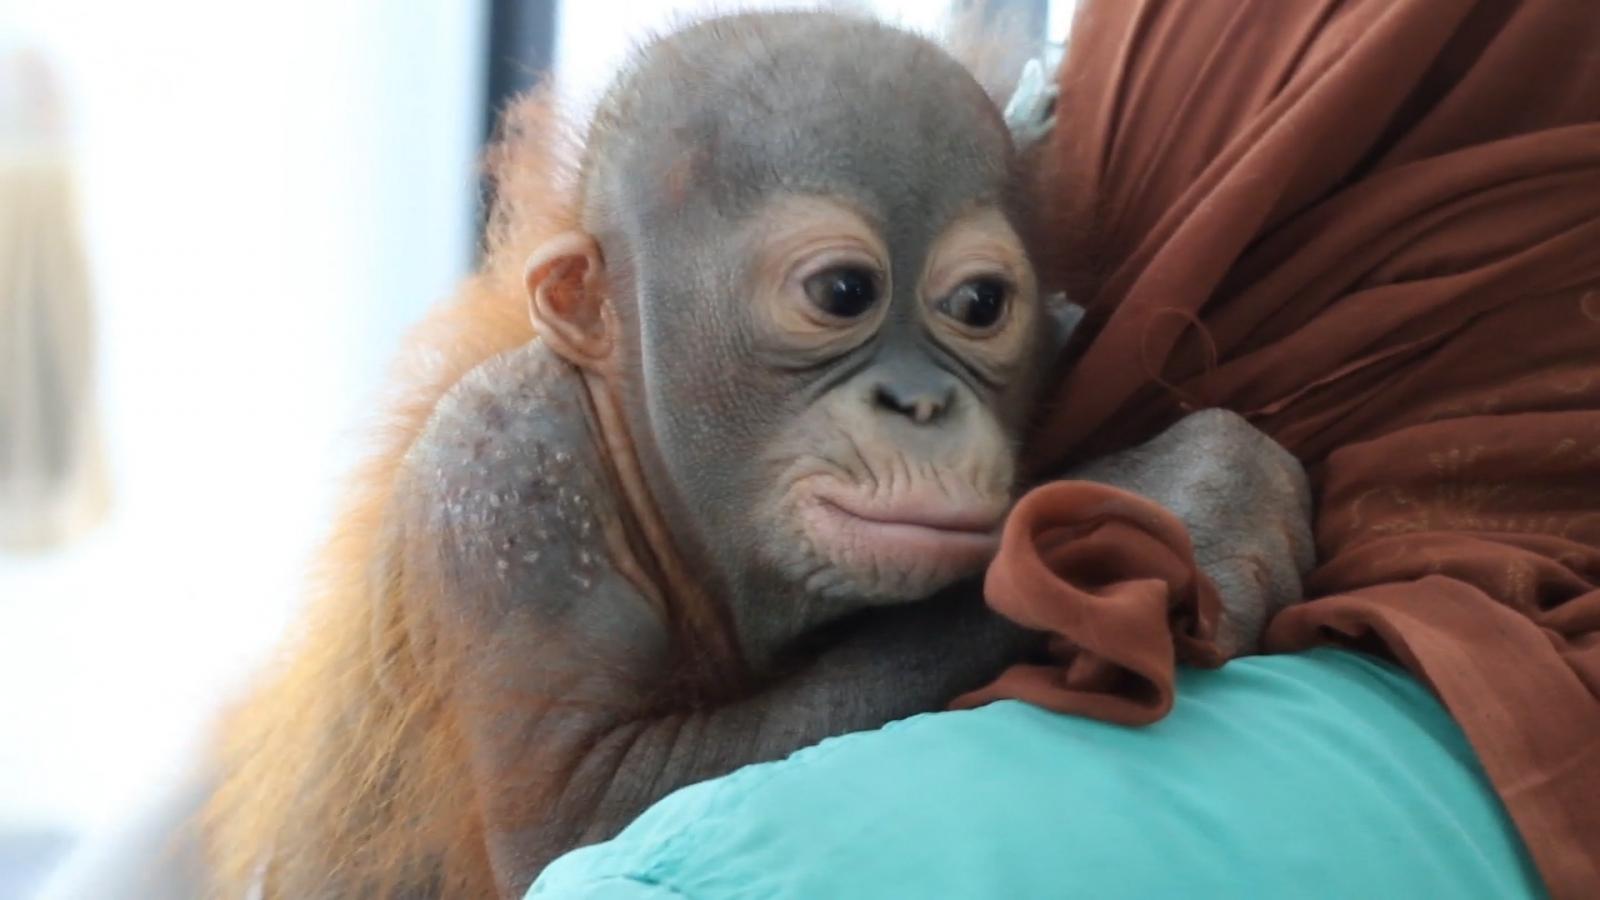 Baby orangutan has bullet removed